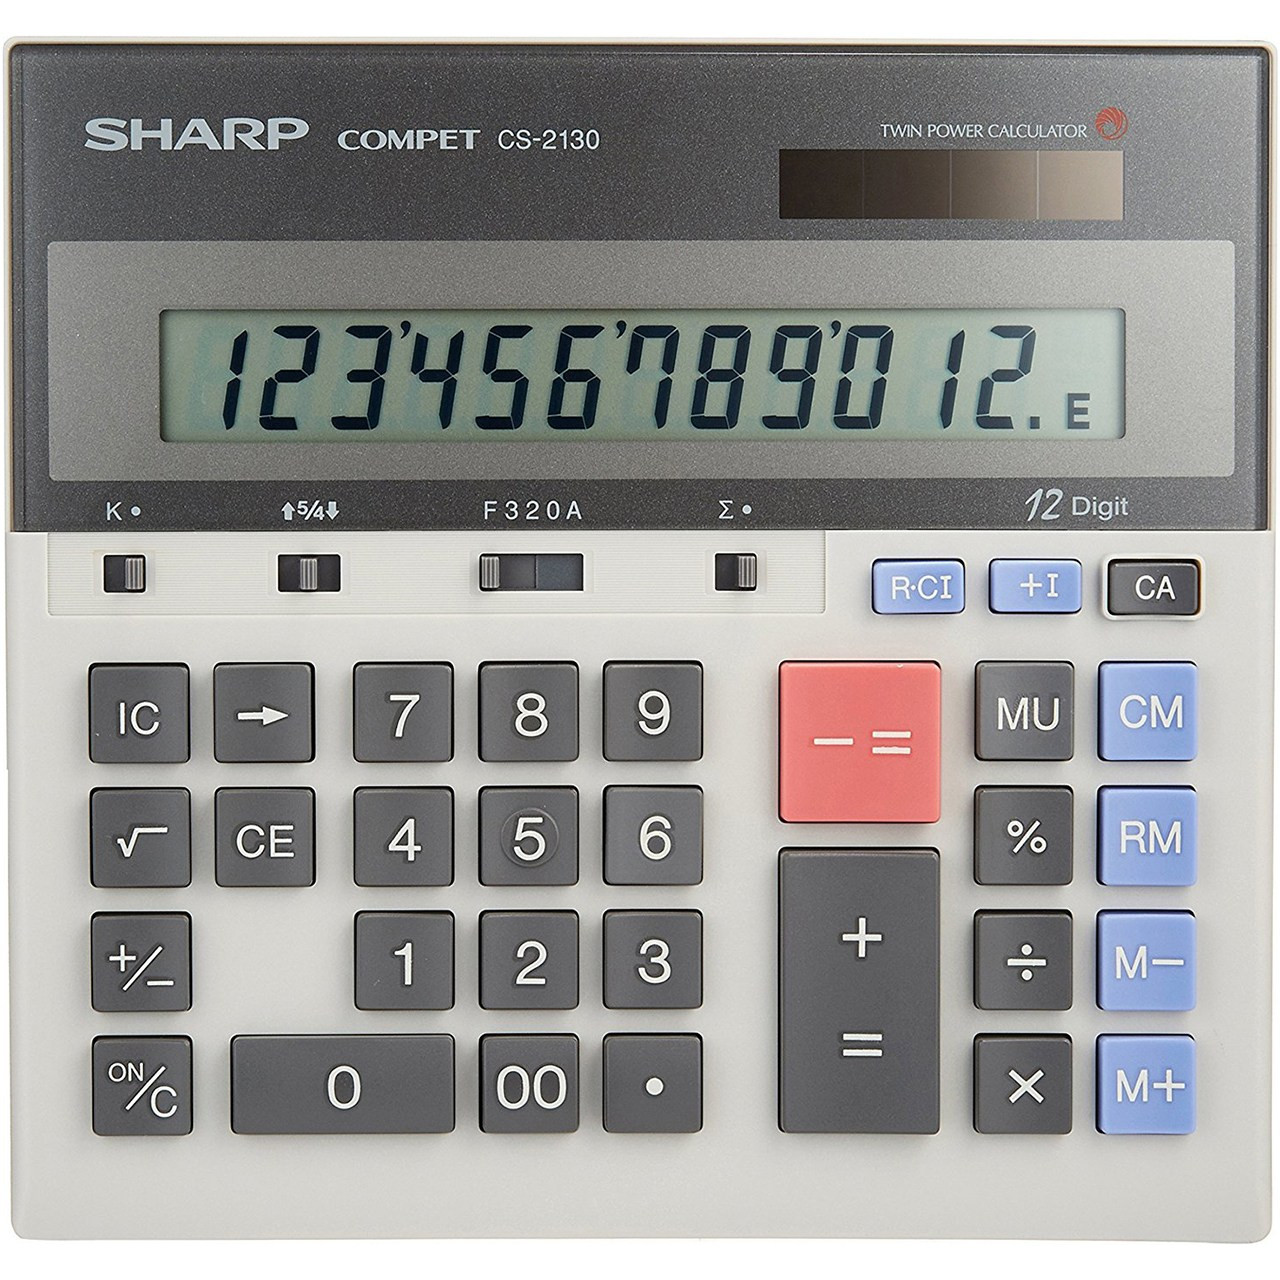 تصویر ماشین حساب شارپ مدل CS-2130|طوسی Sharp CS-2130 Calculator